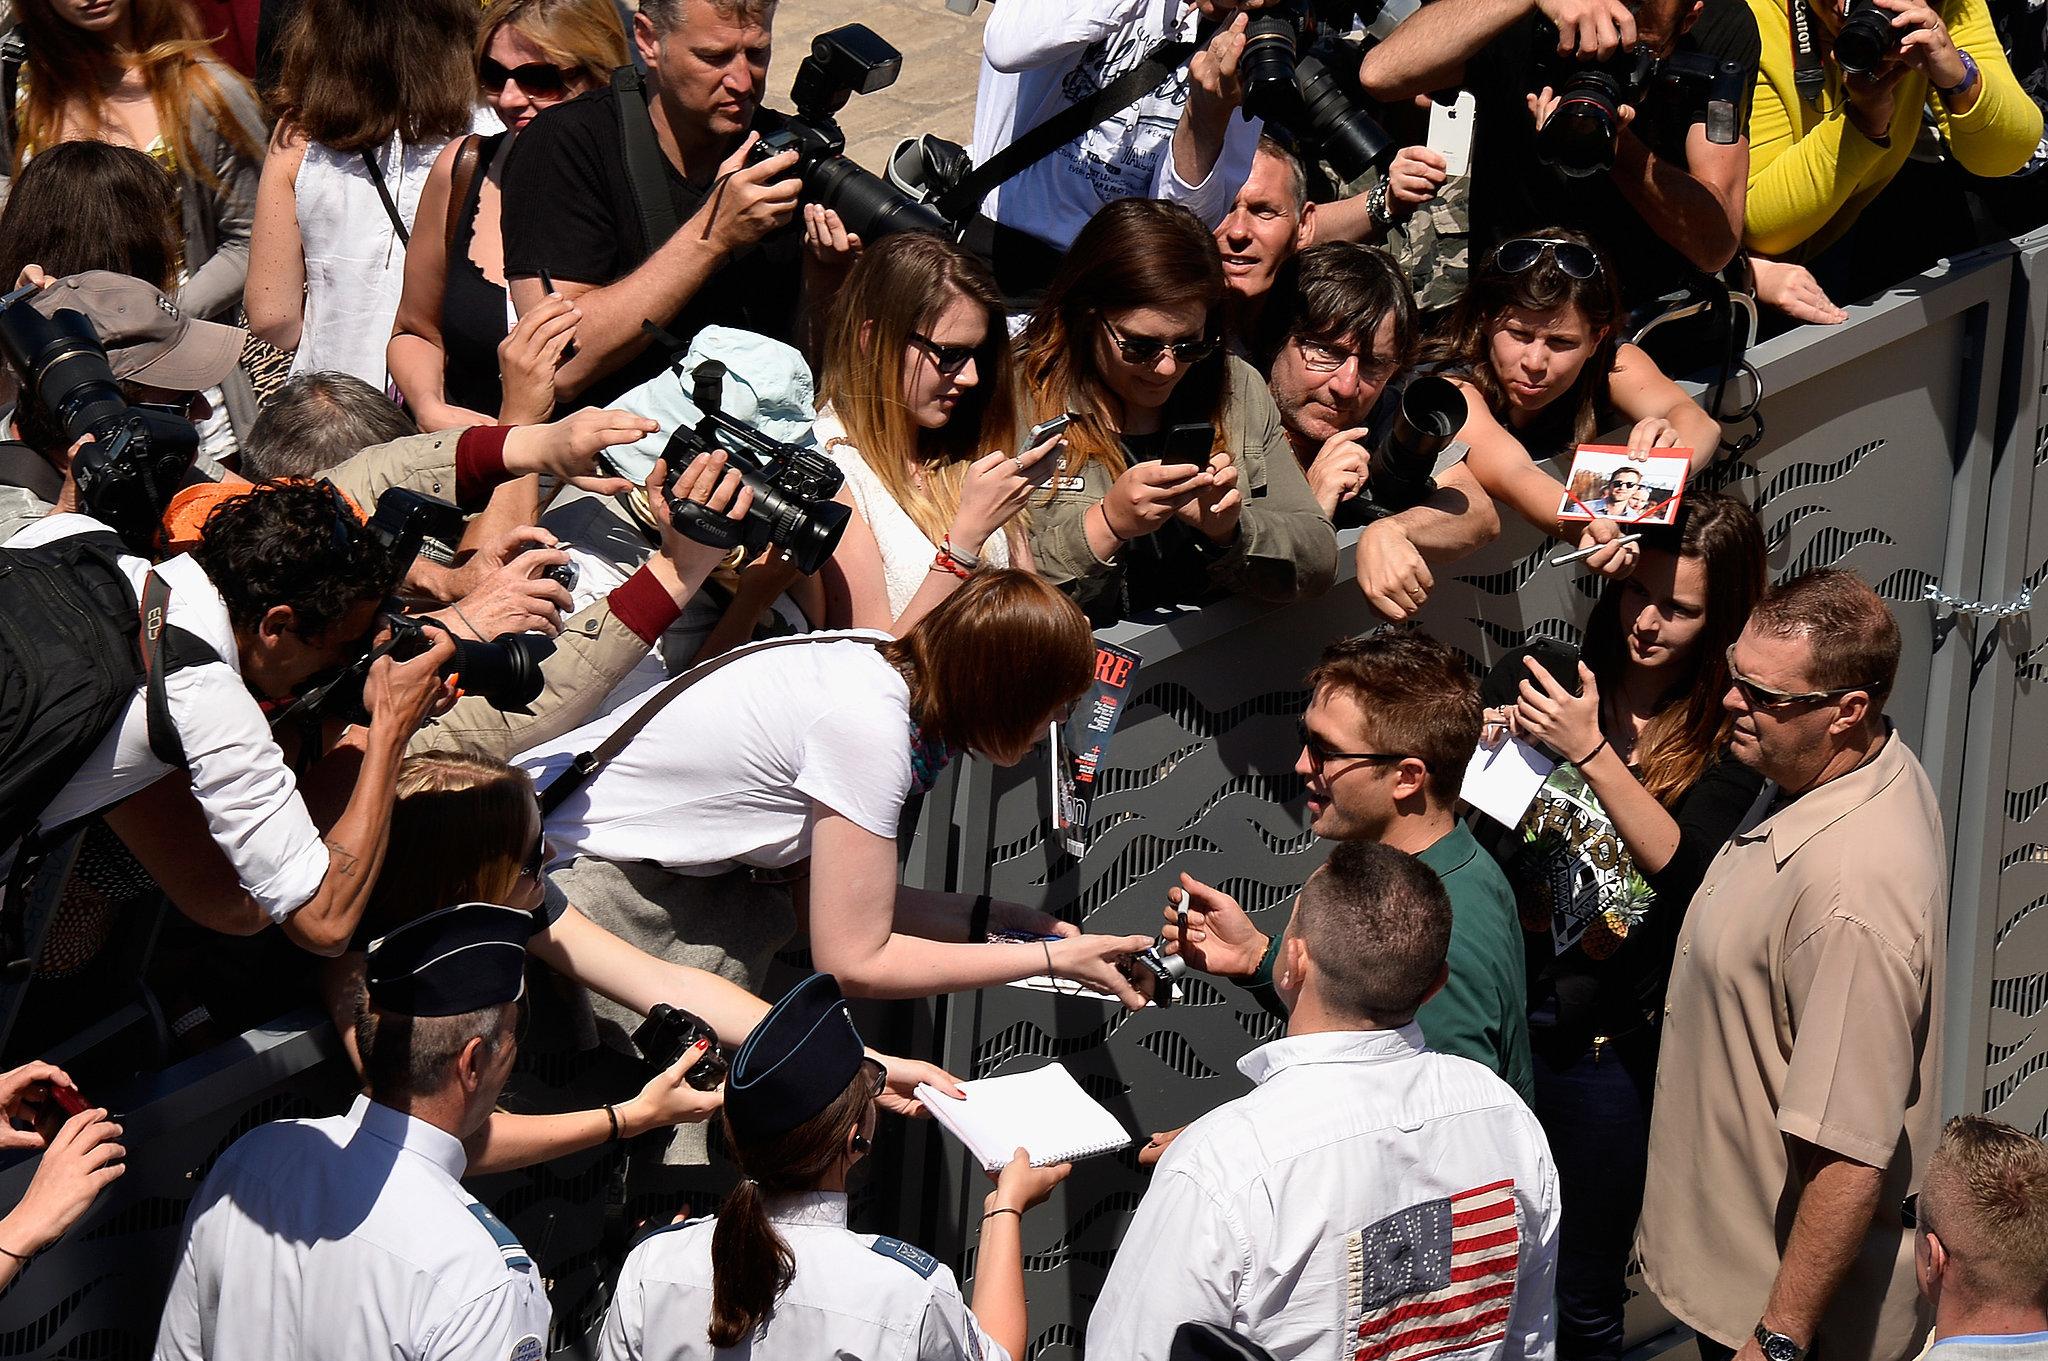 Robert Pattinson had fans for days.